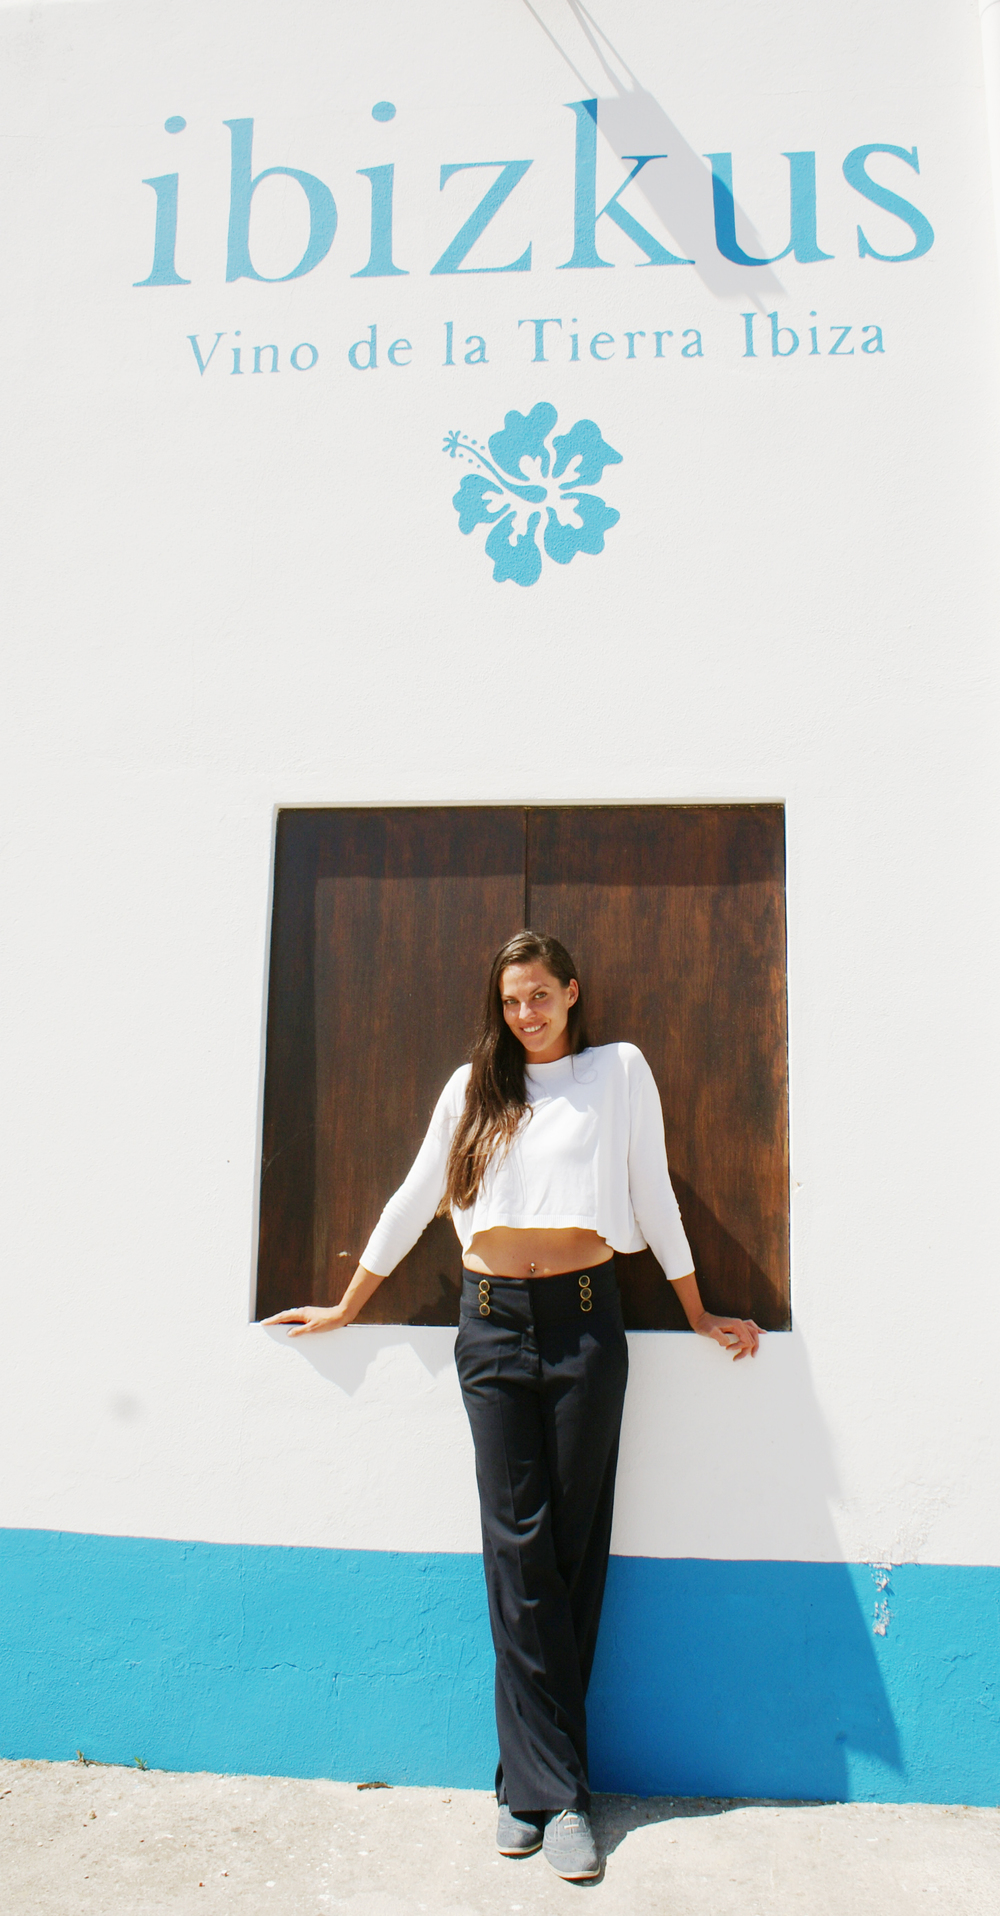 Maggie Karpo, Head Marketing @Ibizkus